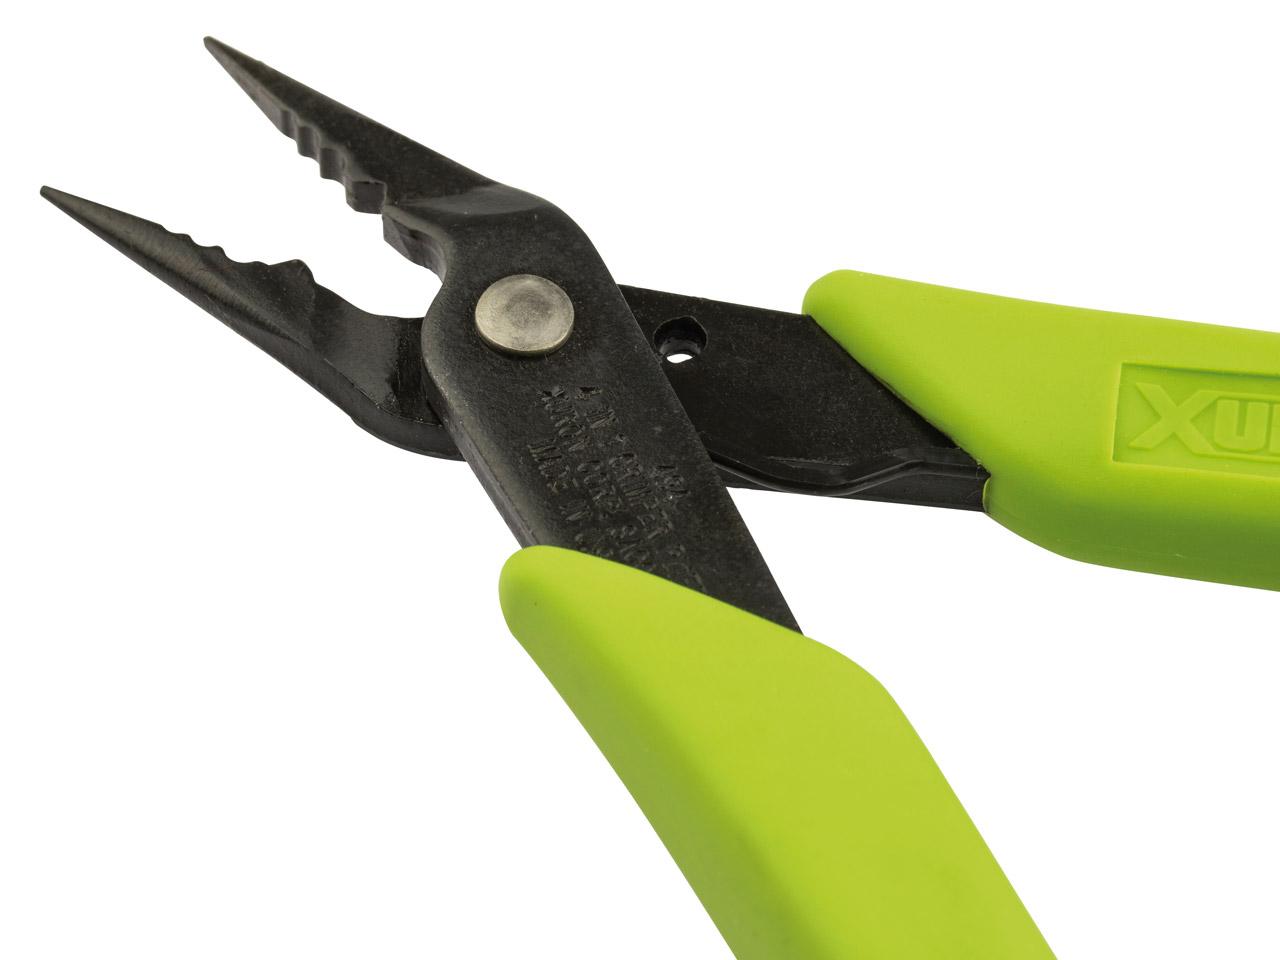 Xuron-Multi-Purpose-Pliers-Cutters-Shears-and-Scissors thumbnail 3